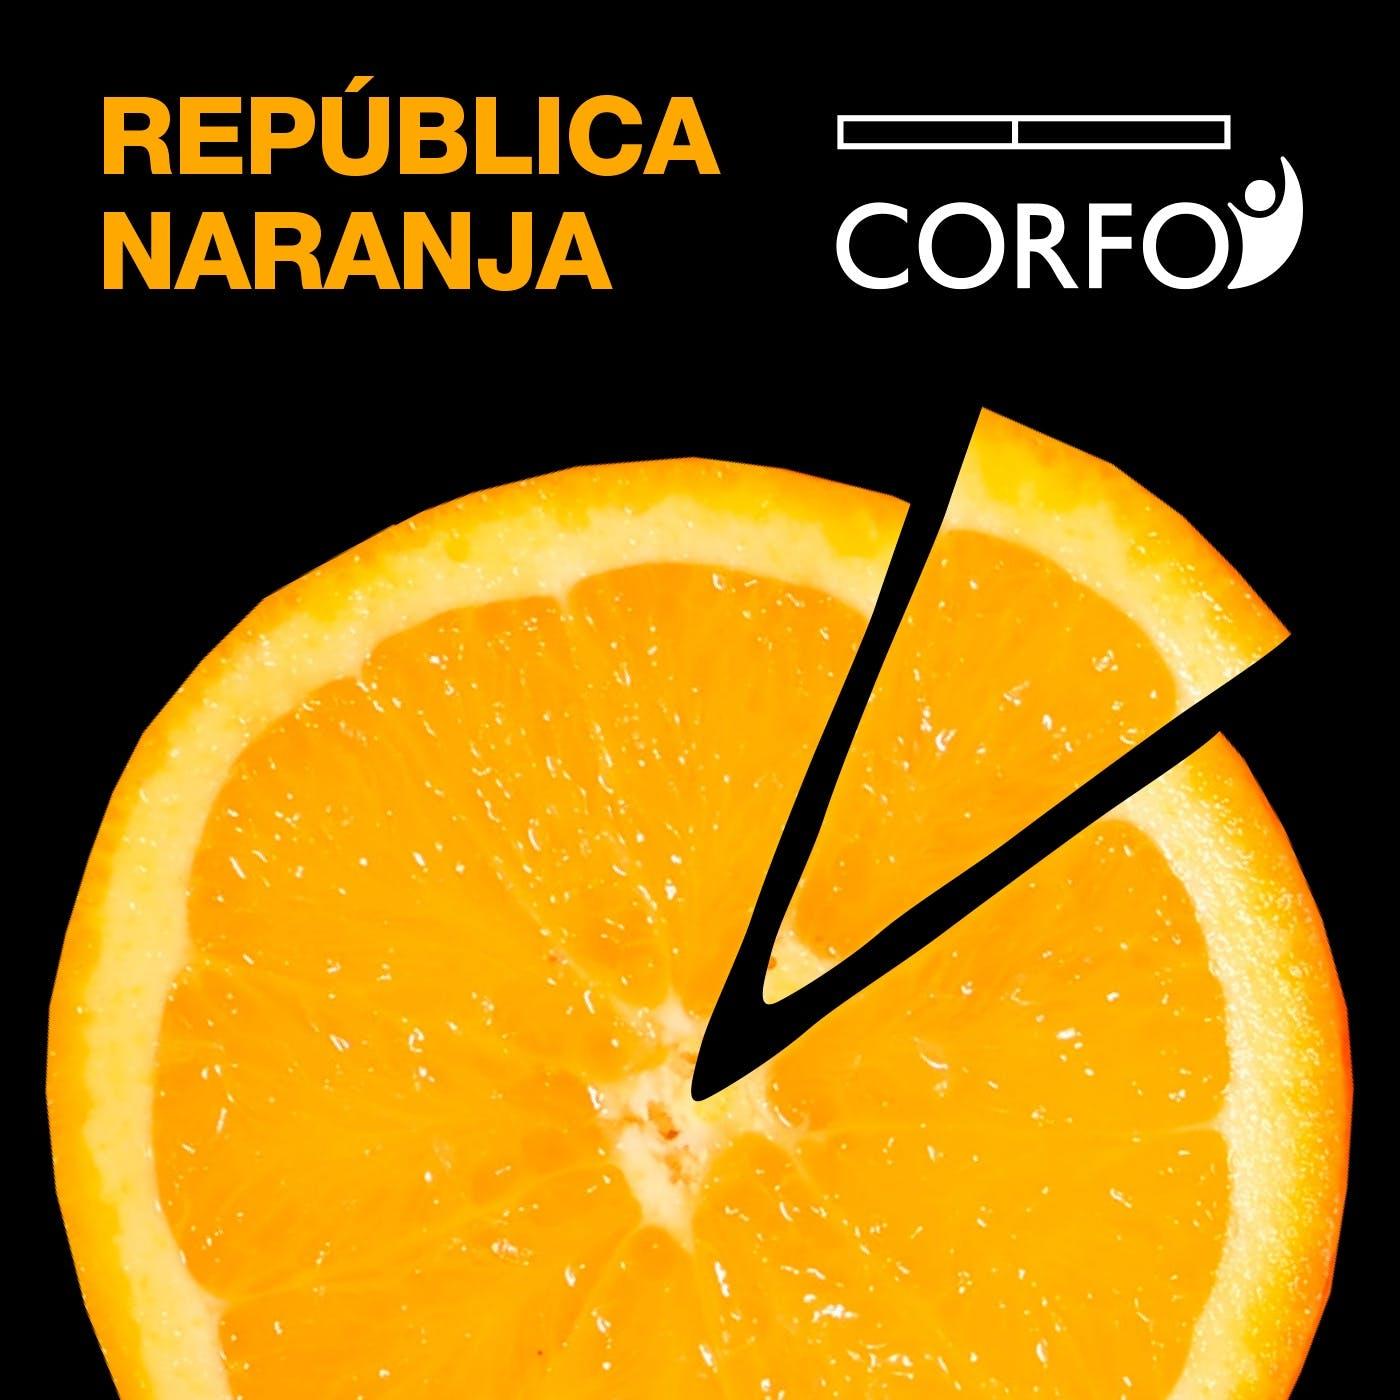 República Naranja